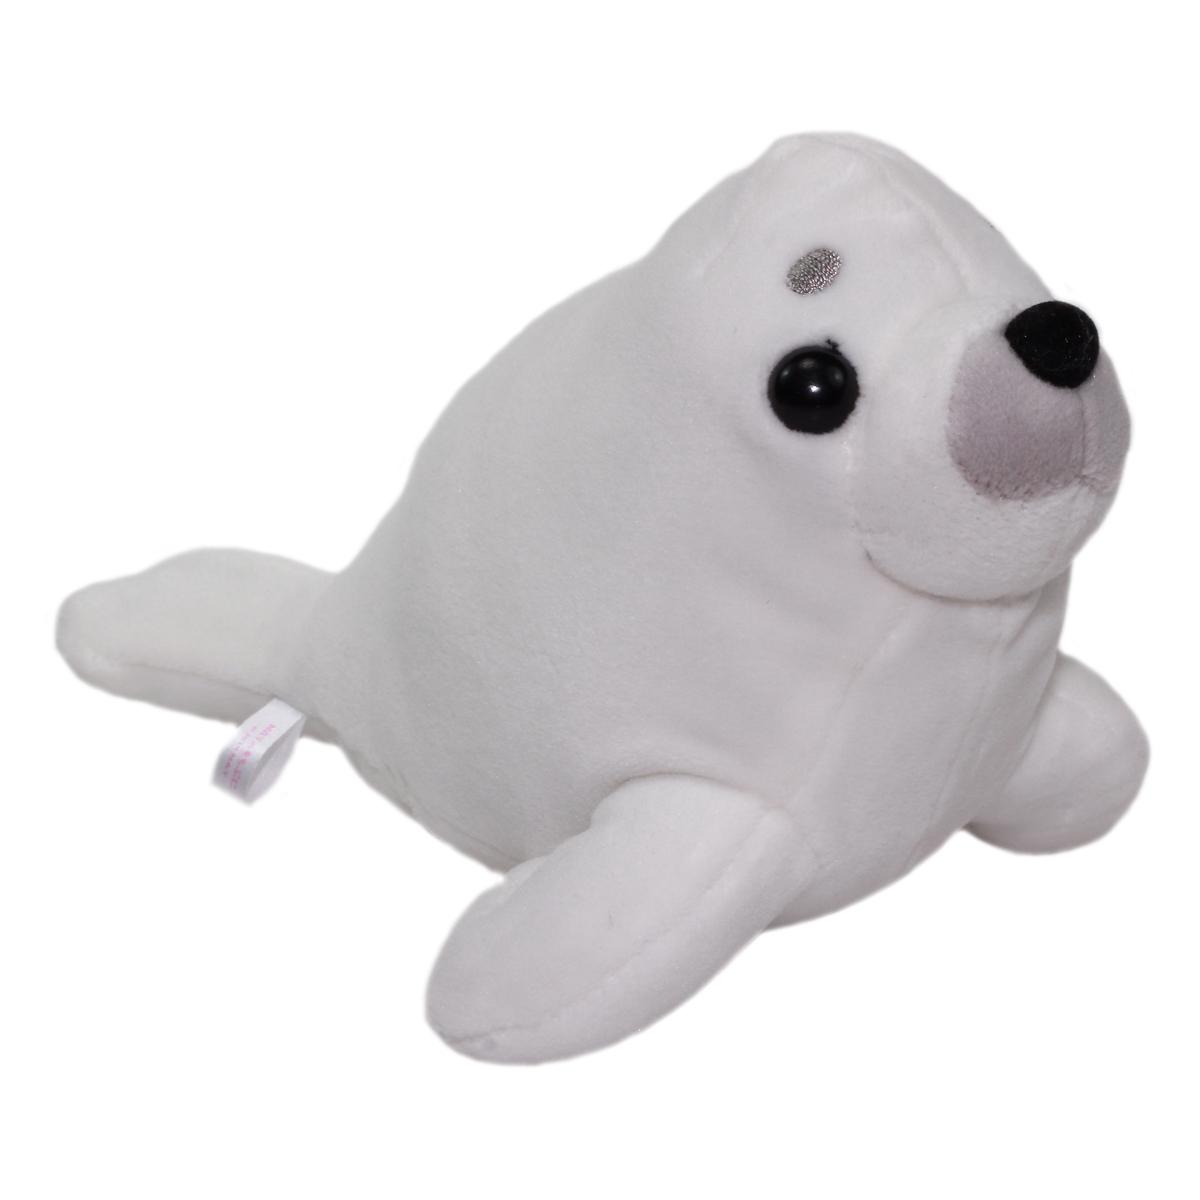 Aquarium Collection Plush Seal Plush Toy Super Soft Stuffed Animal White Azarashi